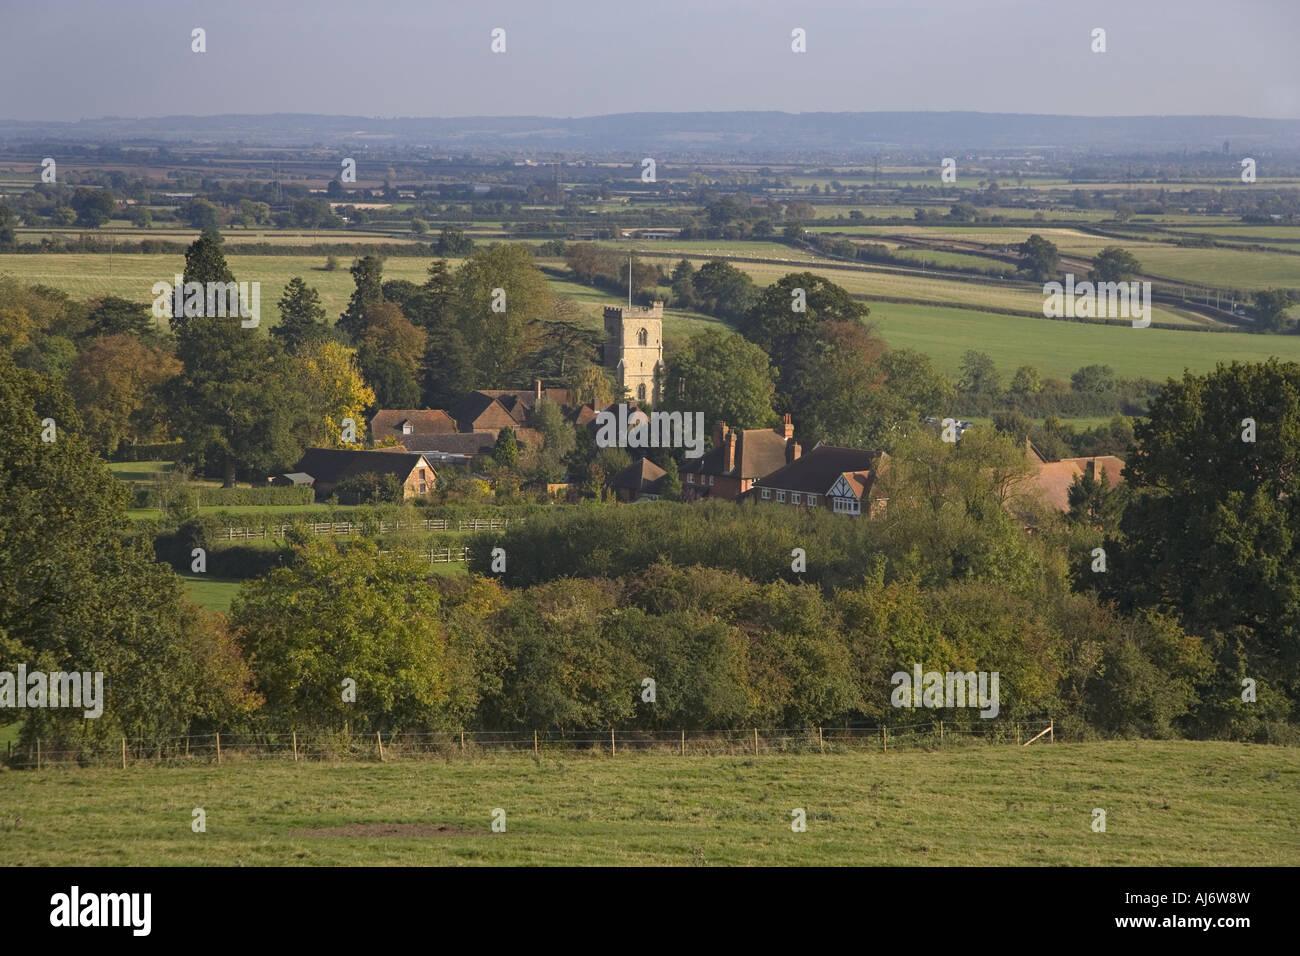 Quainton Village in the Vale of Aylesbury Buckinghamshire - Stock Image